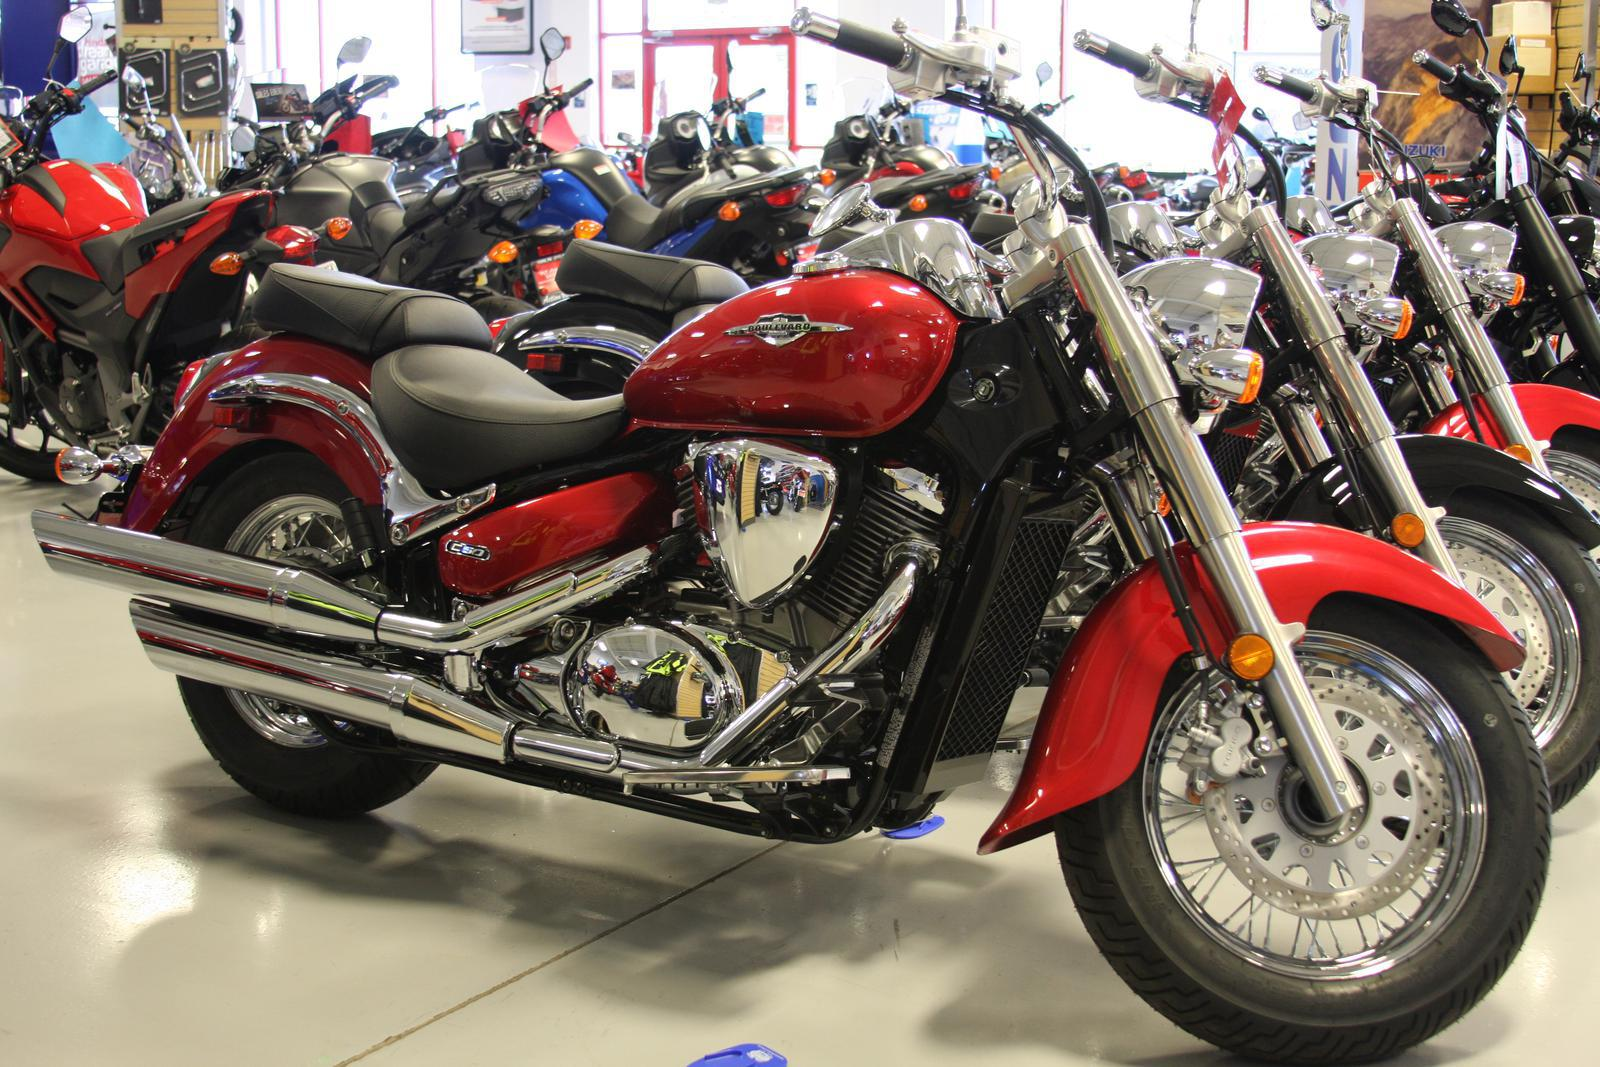 craigslist york pa motorcycles